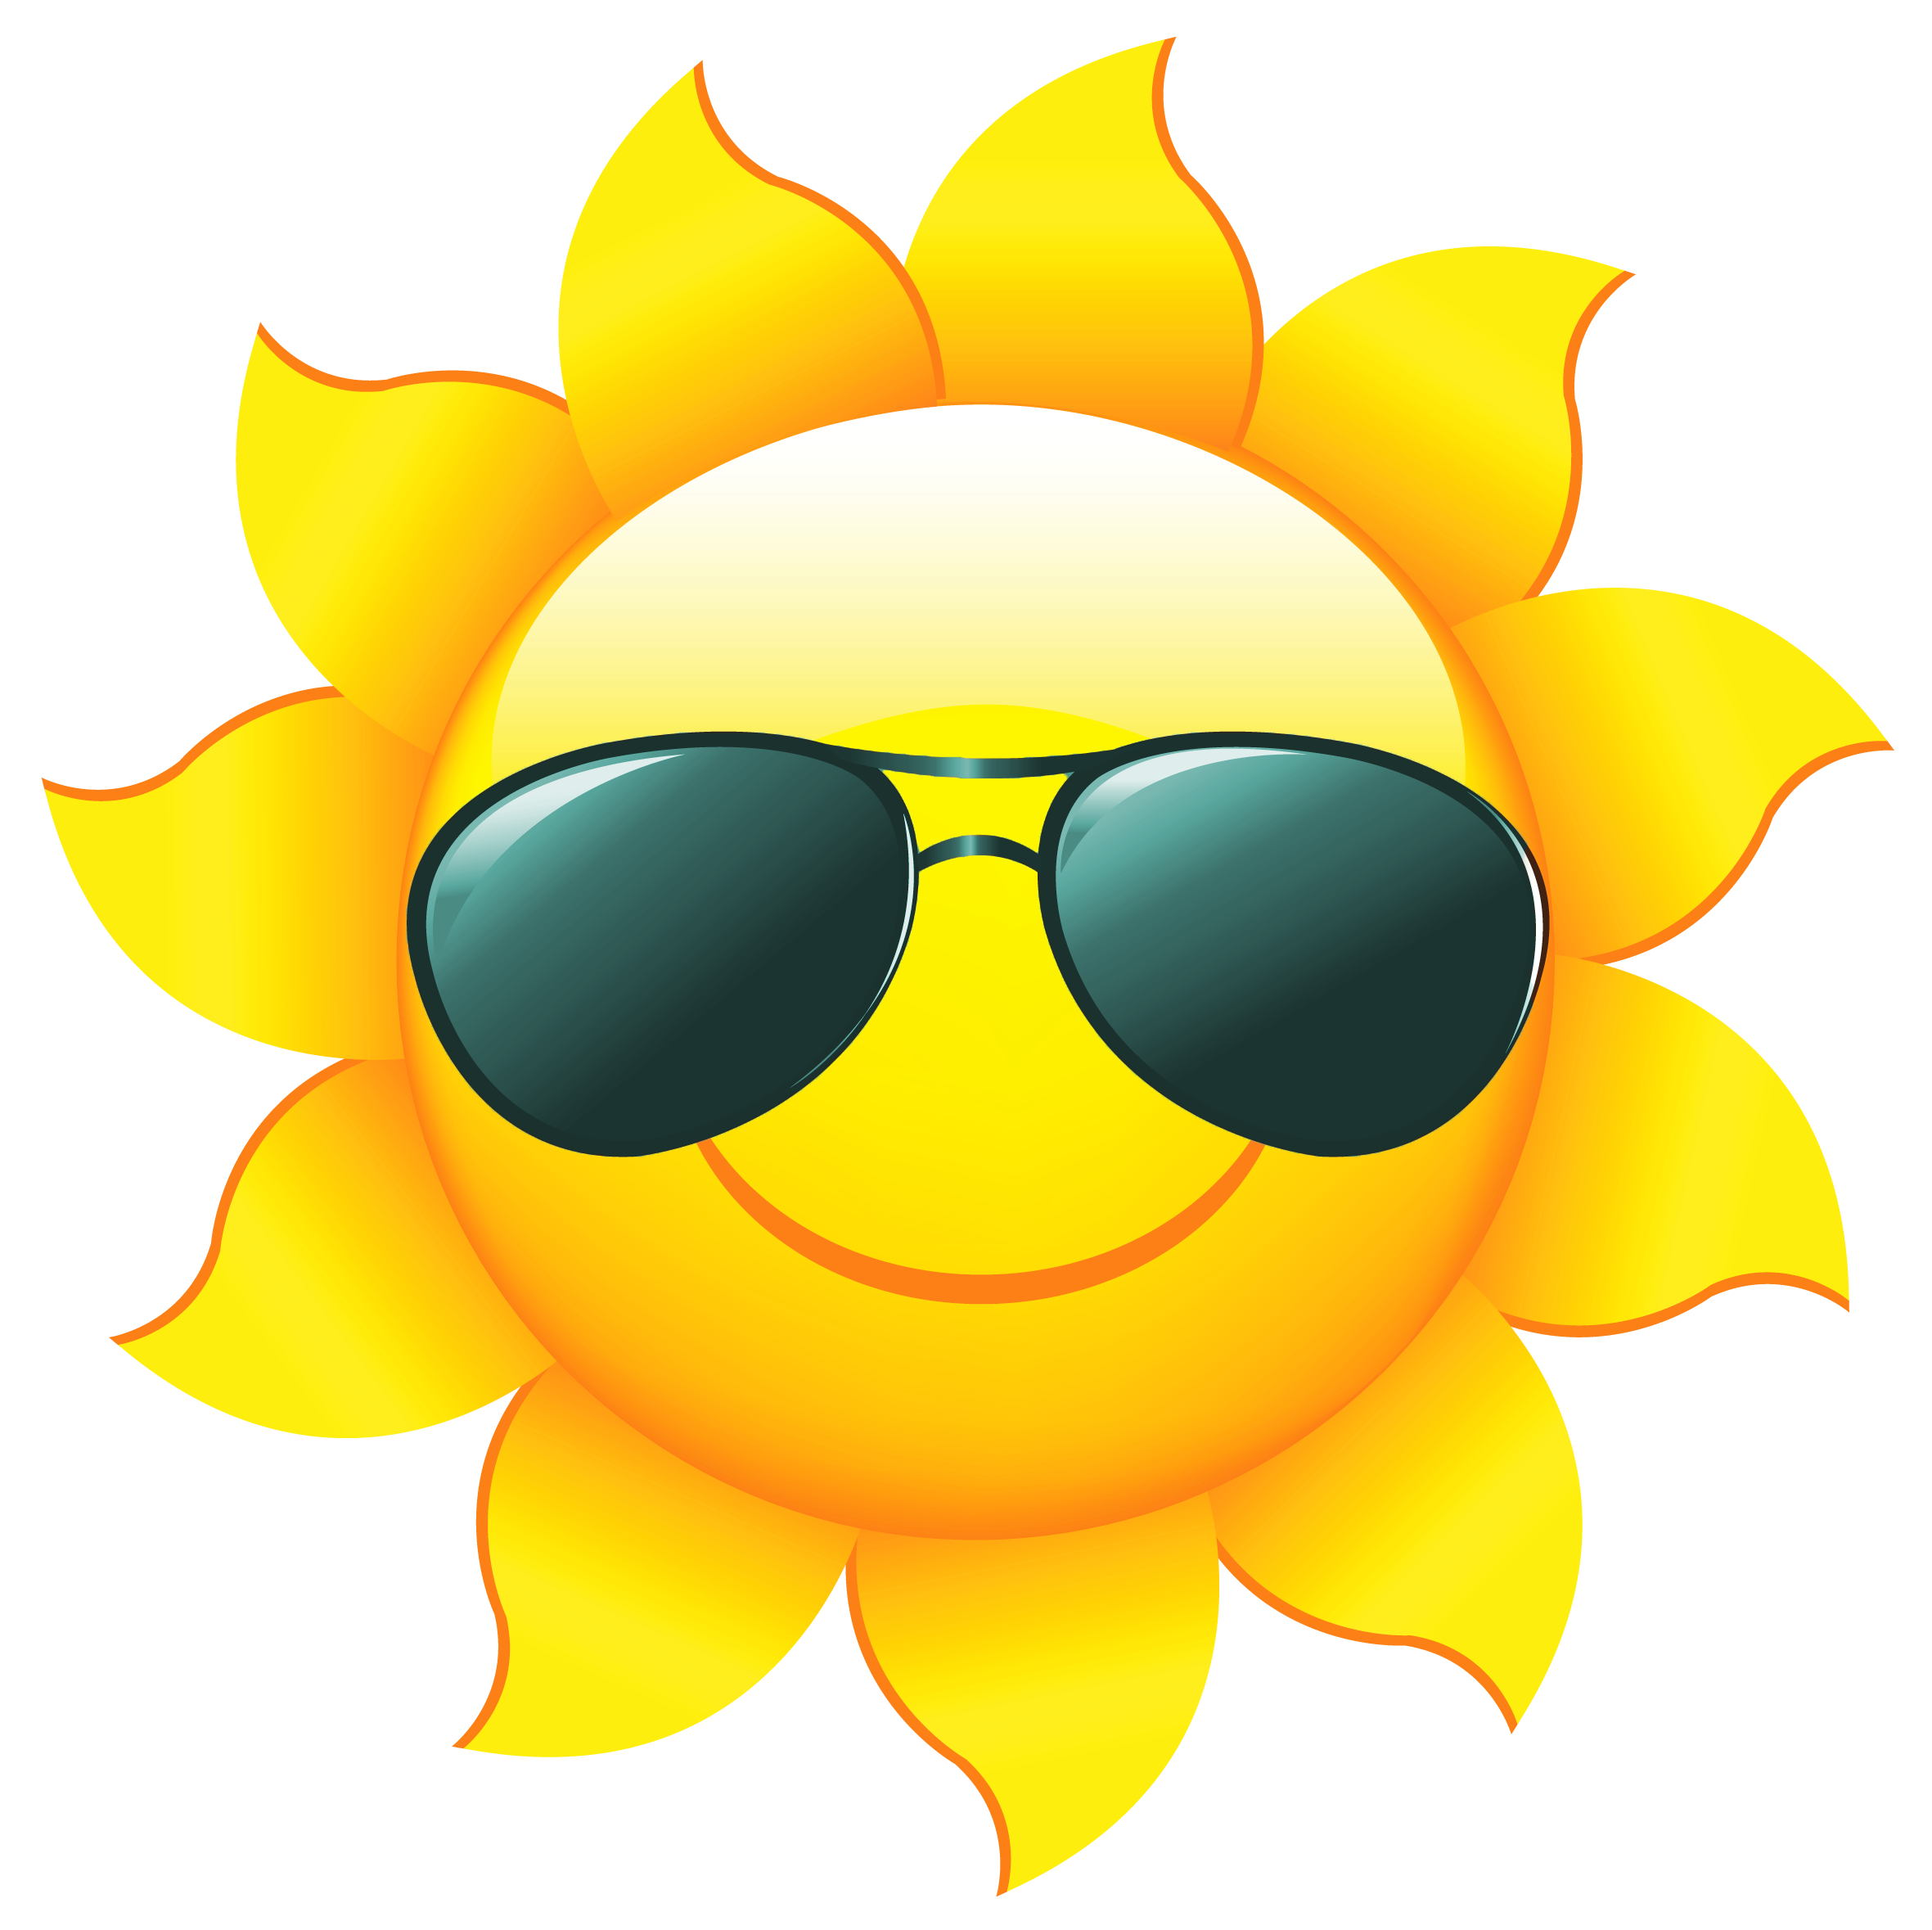 Sunshine Sun Clip Art With Transparent B-Sunshine sun clip art with transparent background free-16